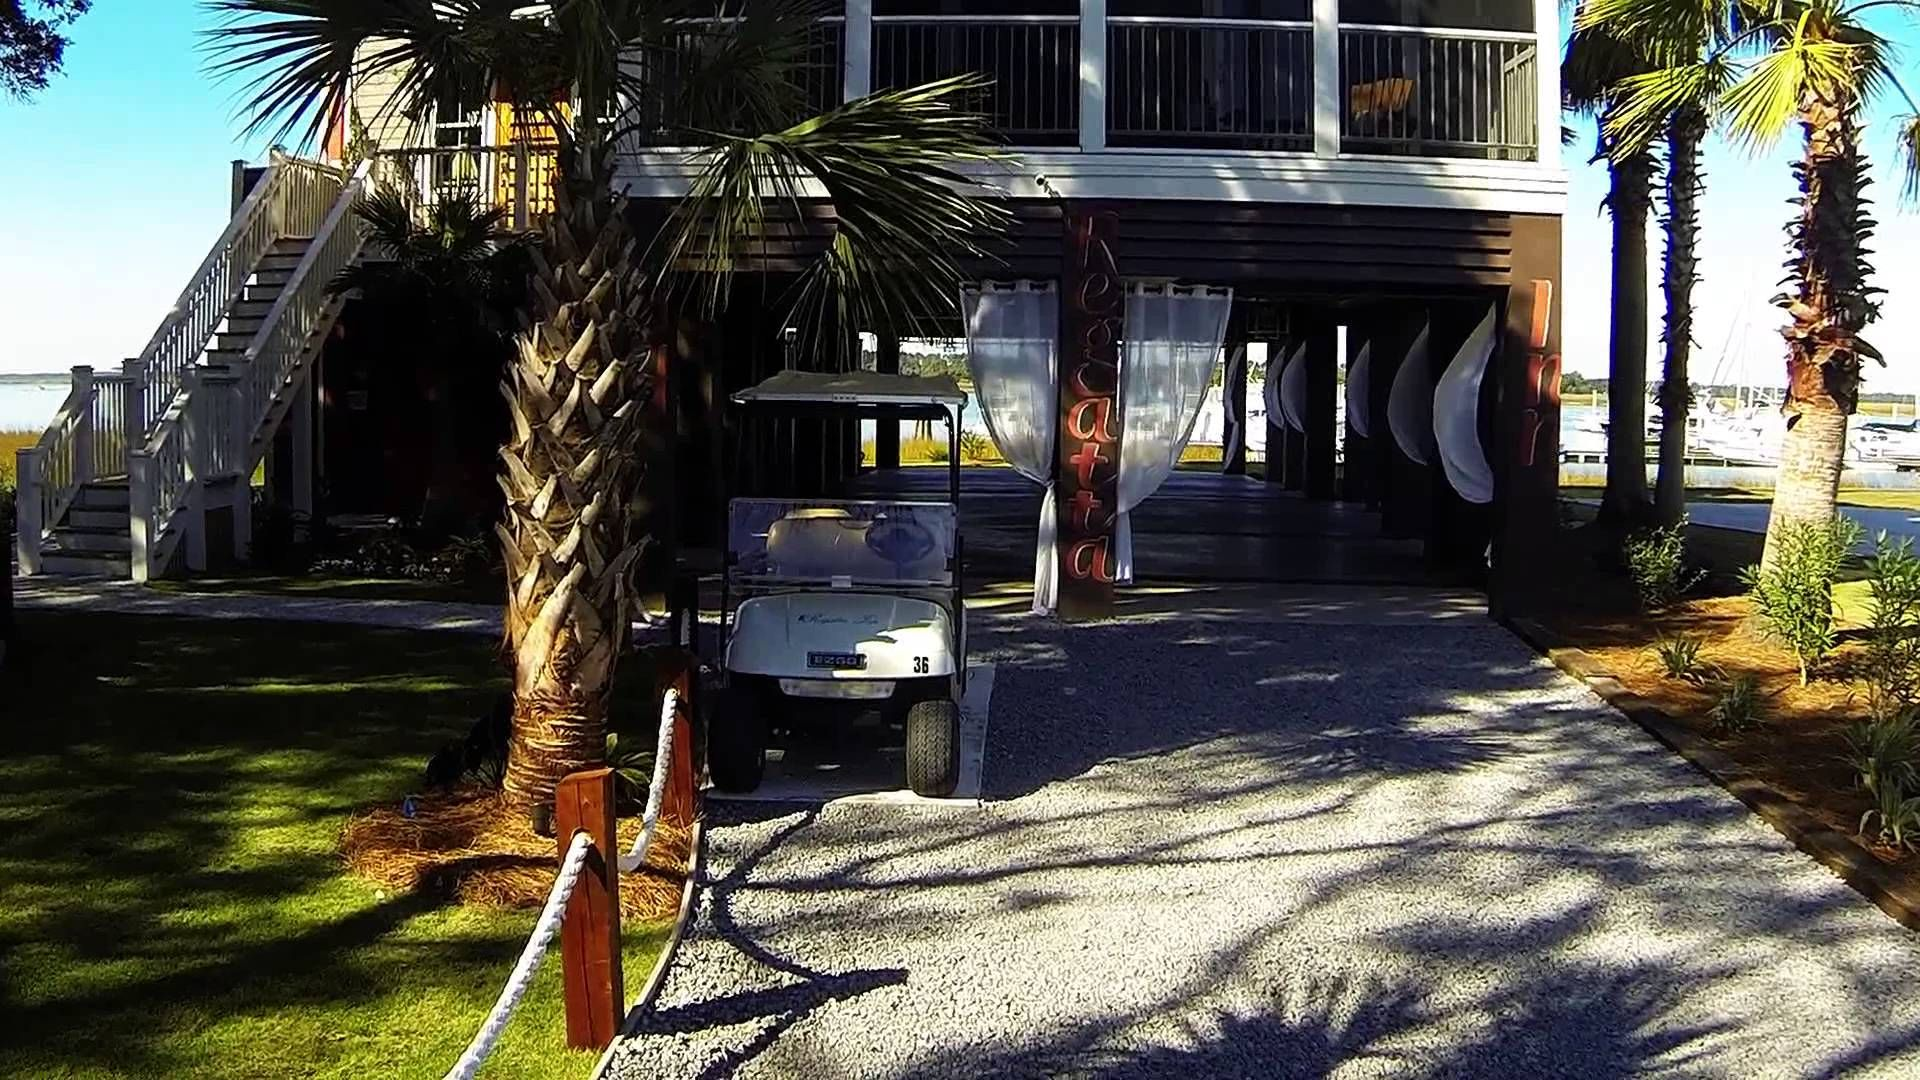 Regatta Inn Folly Beach Family excursions, Oh the places